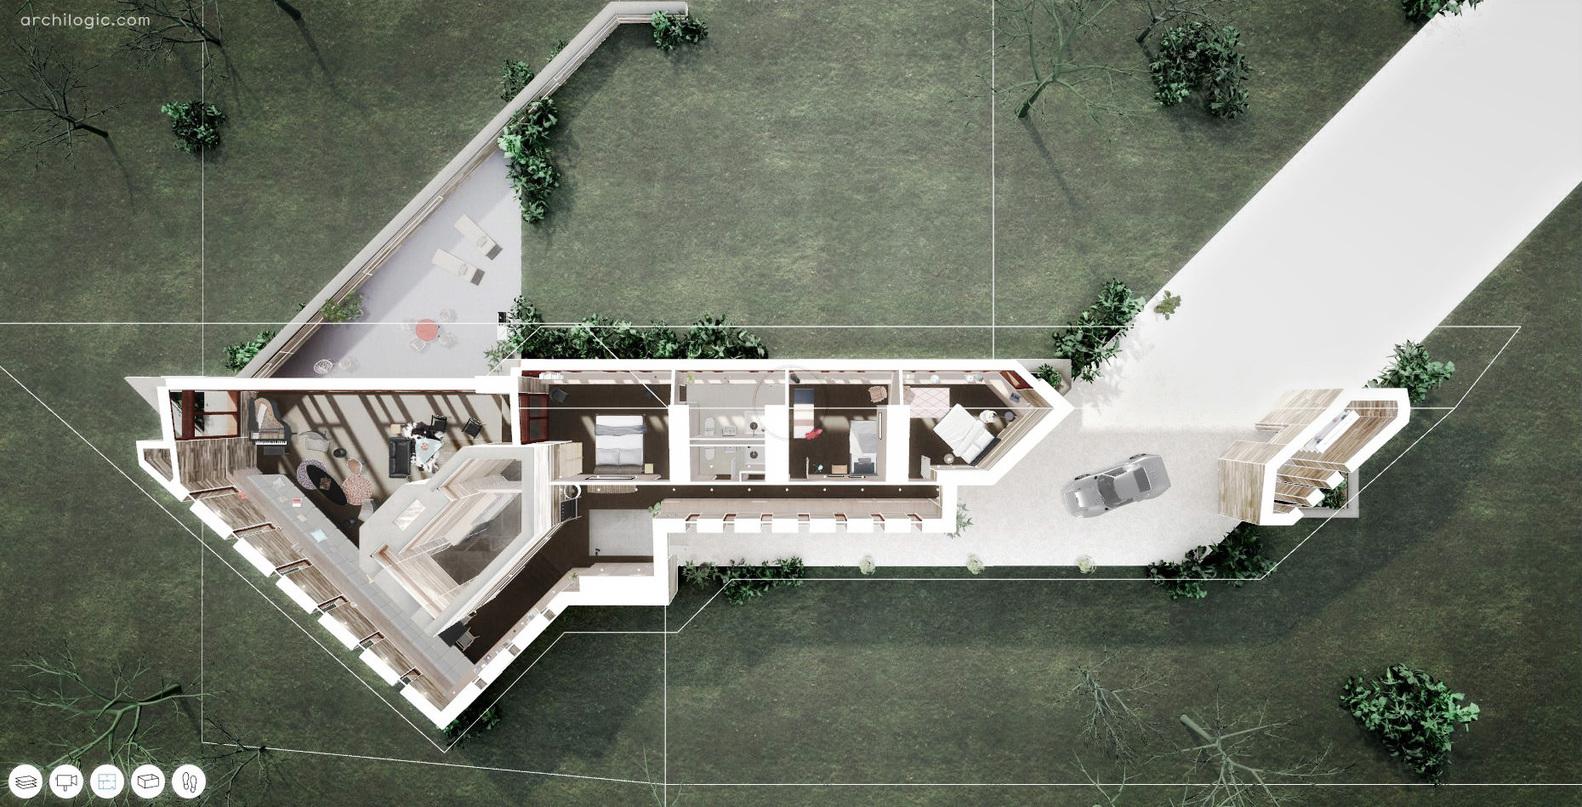 günstig kaufen das beste mäßiger Preis Gallery of Tour Frank Lloyd Wright's Final (Unbuilt) House ...